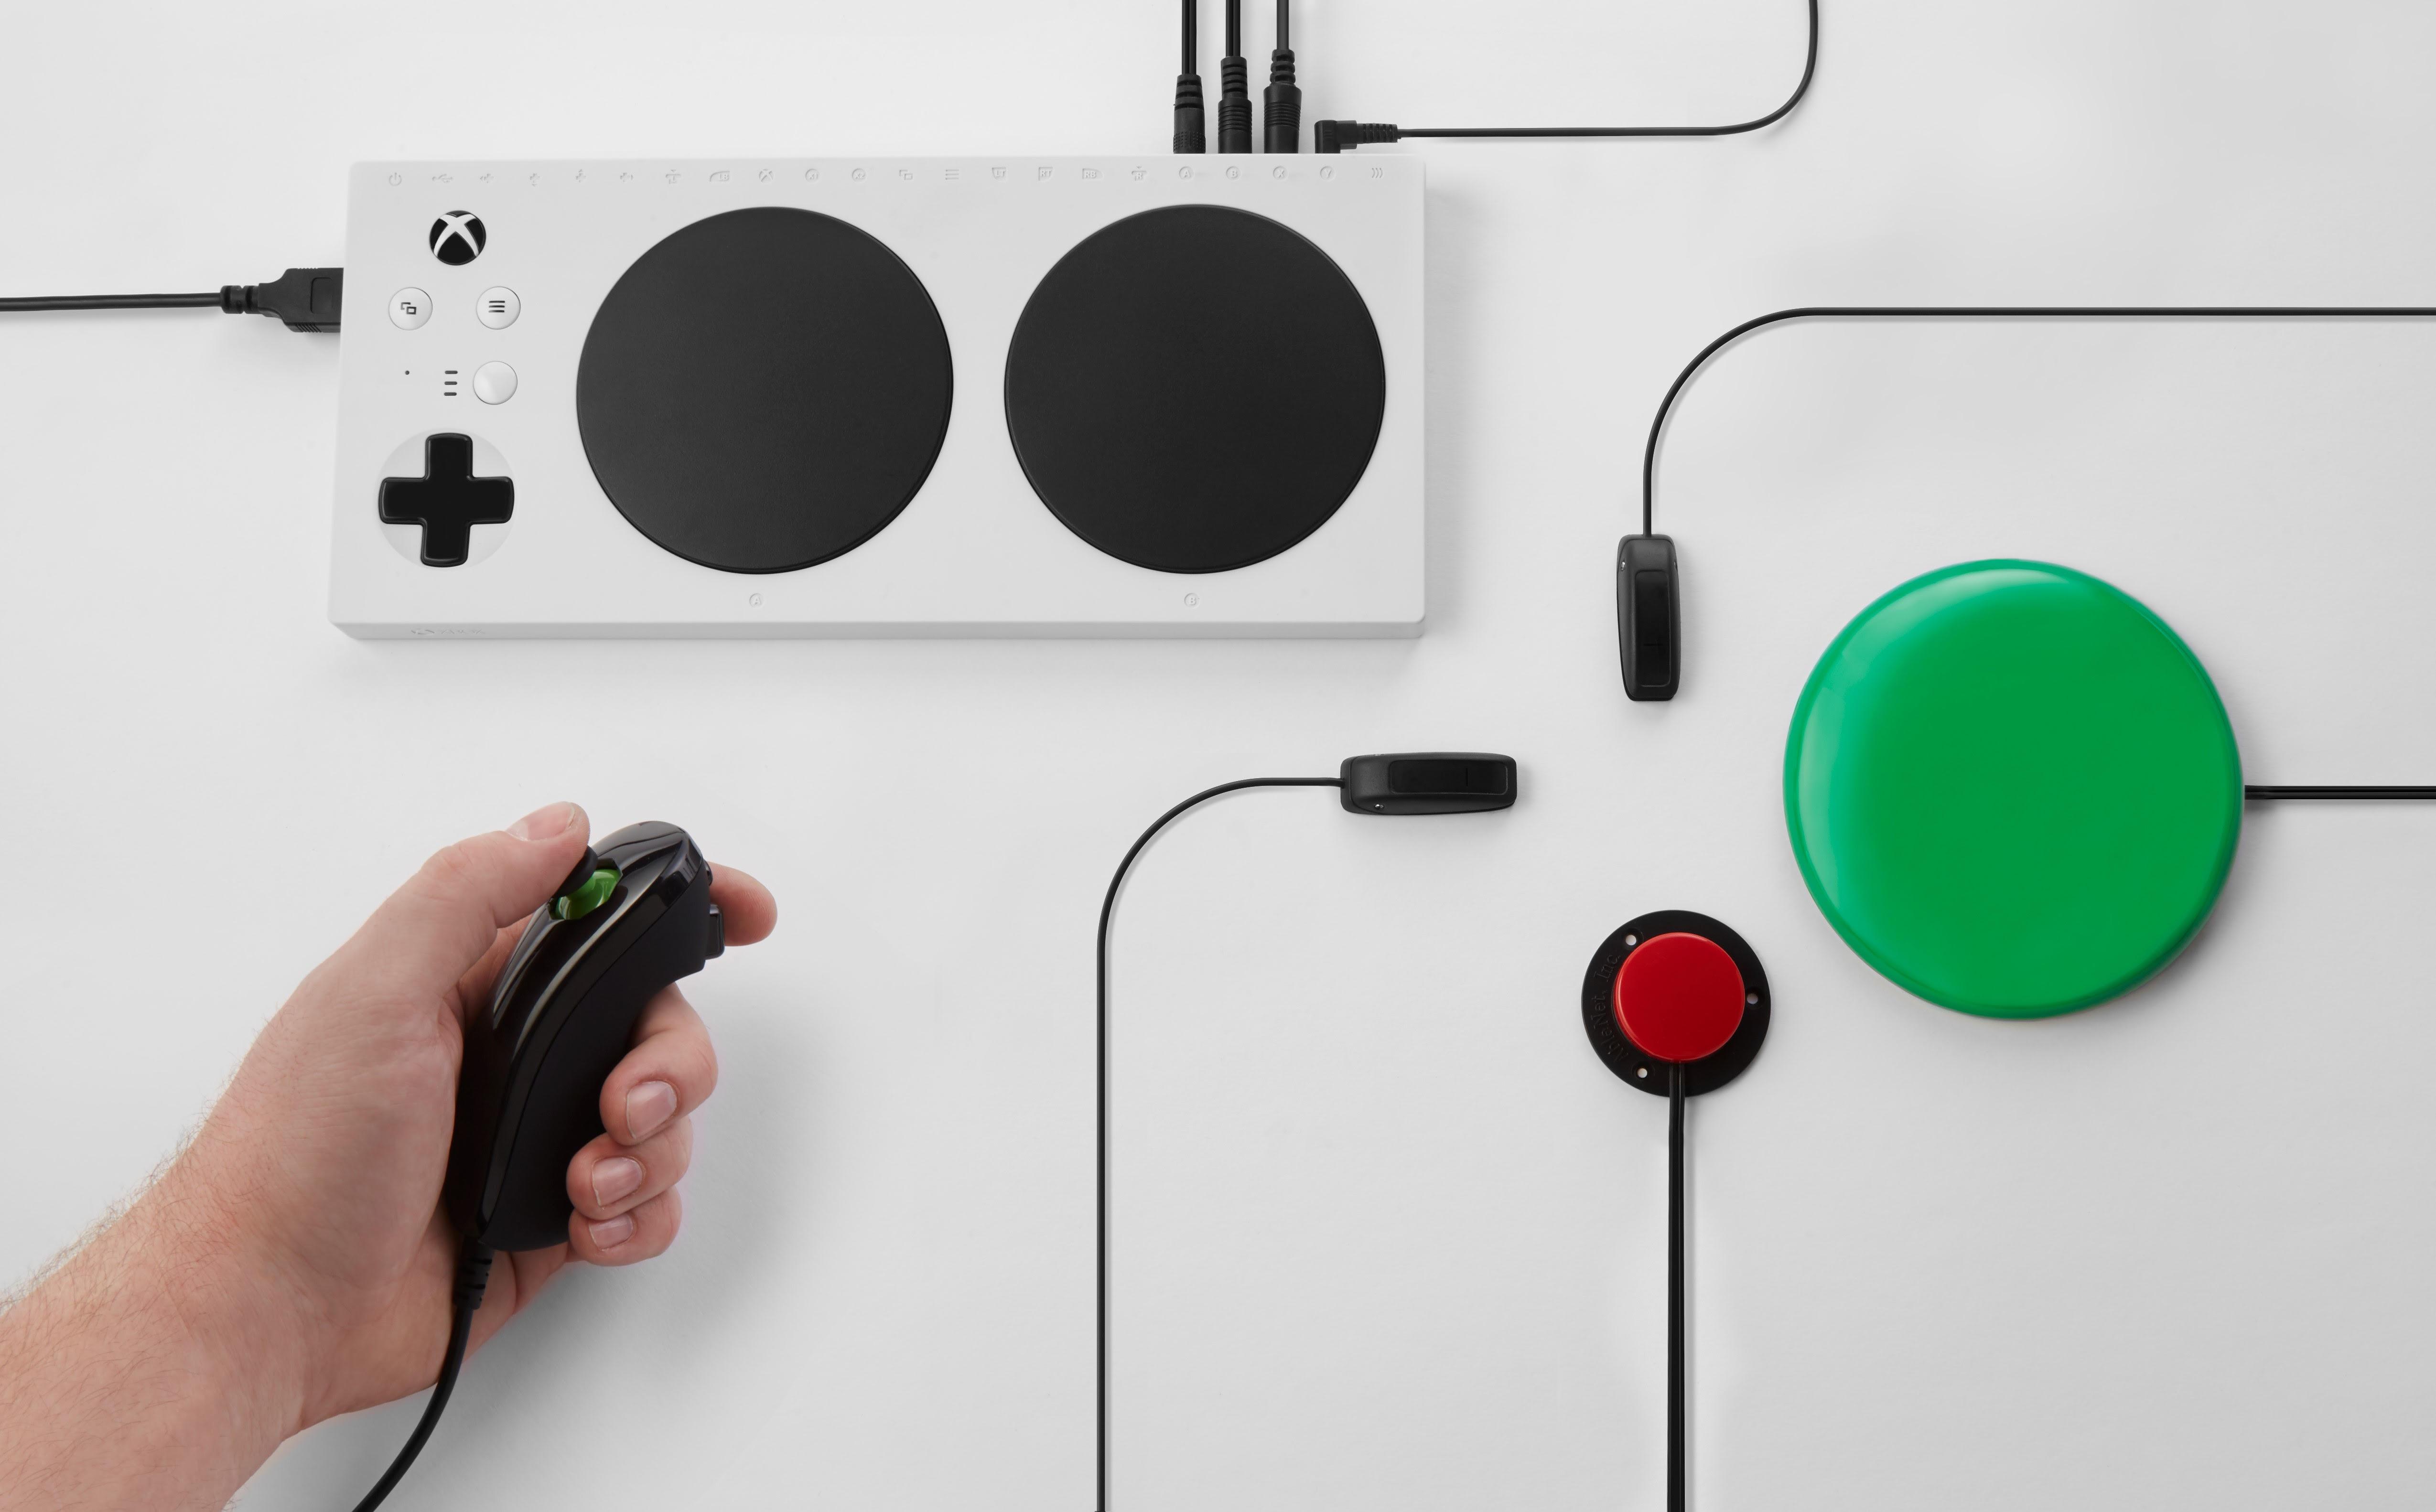 Xbox Adaptive Controller triunfa en el Festival Cannes Lions